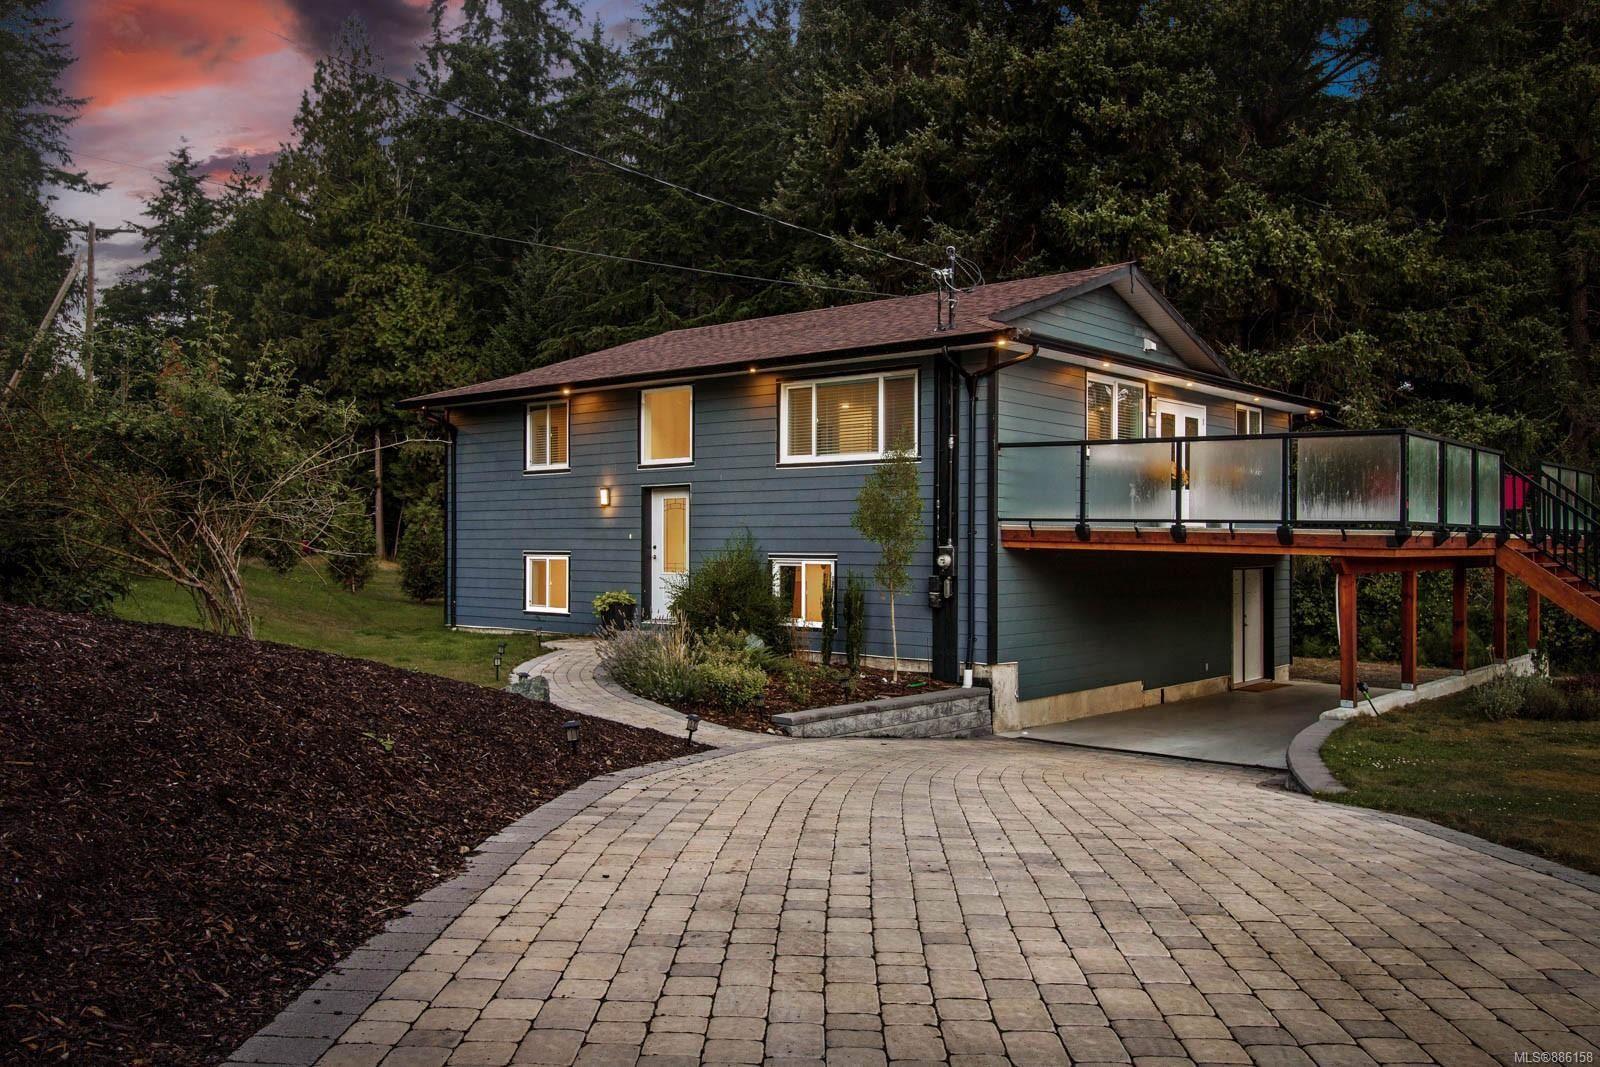 Main Photo: 1800 Greenwood Cres in : CV Comox Peninsula House for sale (Comox Valley)  : MLS®# 886158